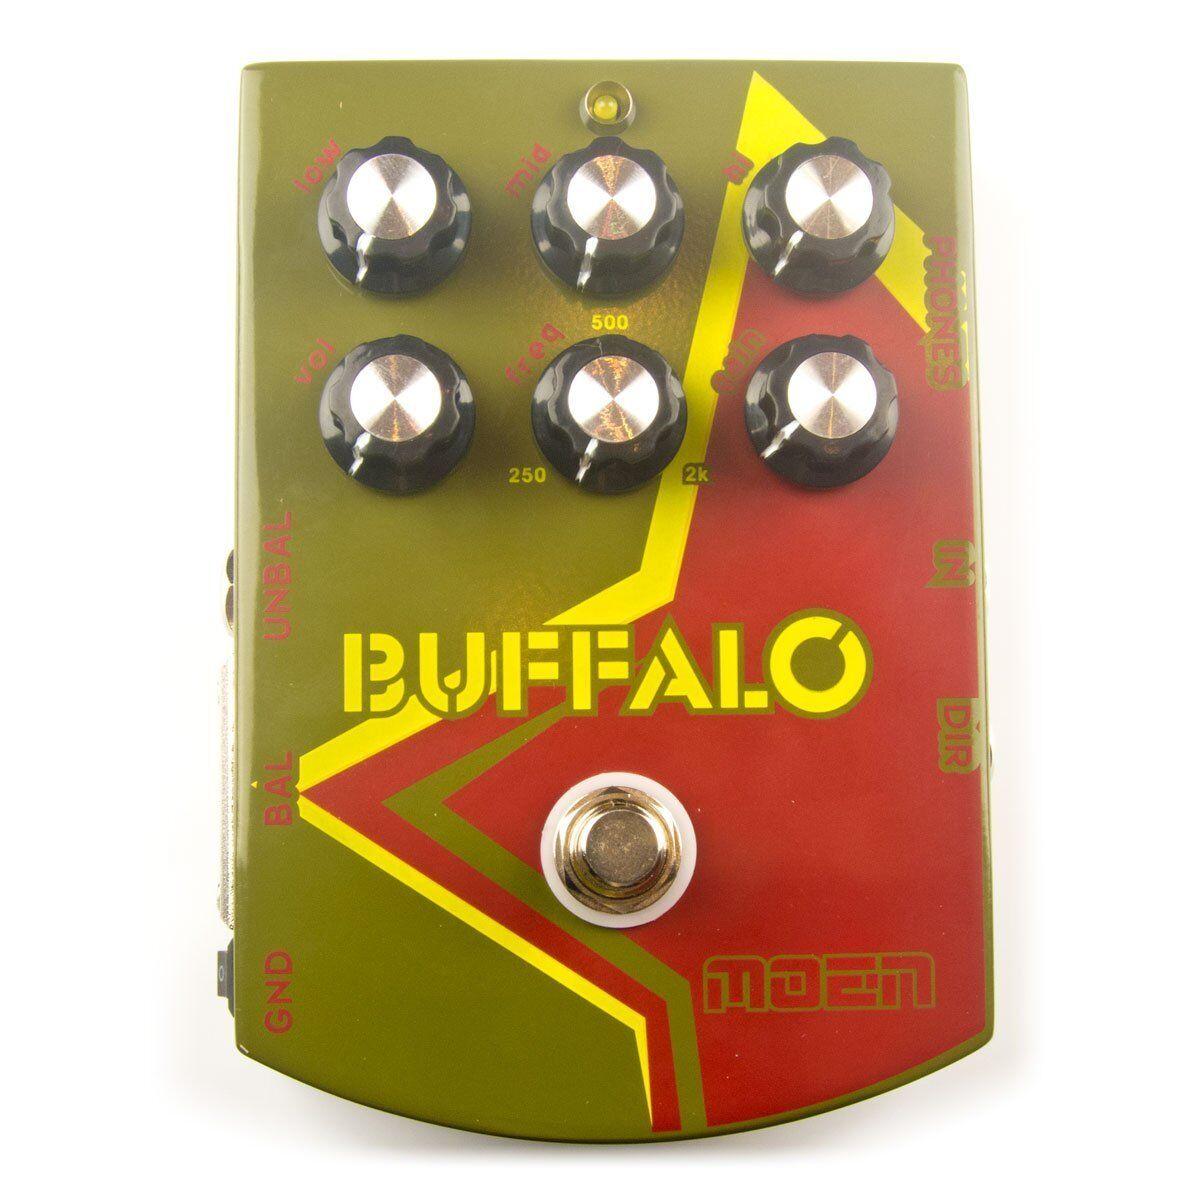 Moen MO-BA Buffalo GEN GEN GEN 3 EQ de barrido de frecuencias medias, Caja DI, Guitarra Pedal Nuevo fc3a60